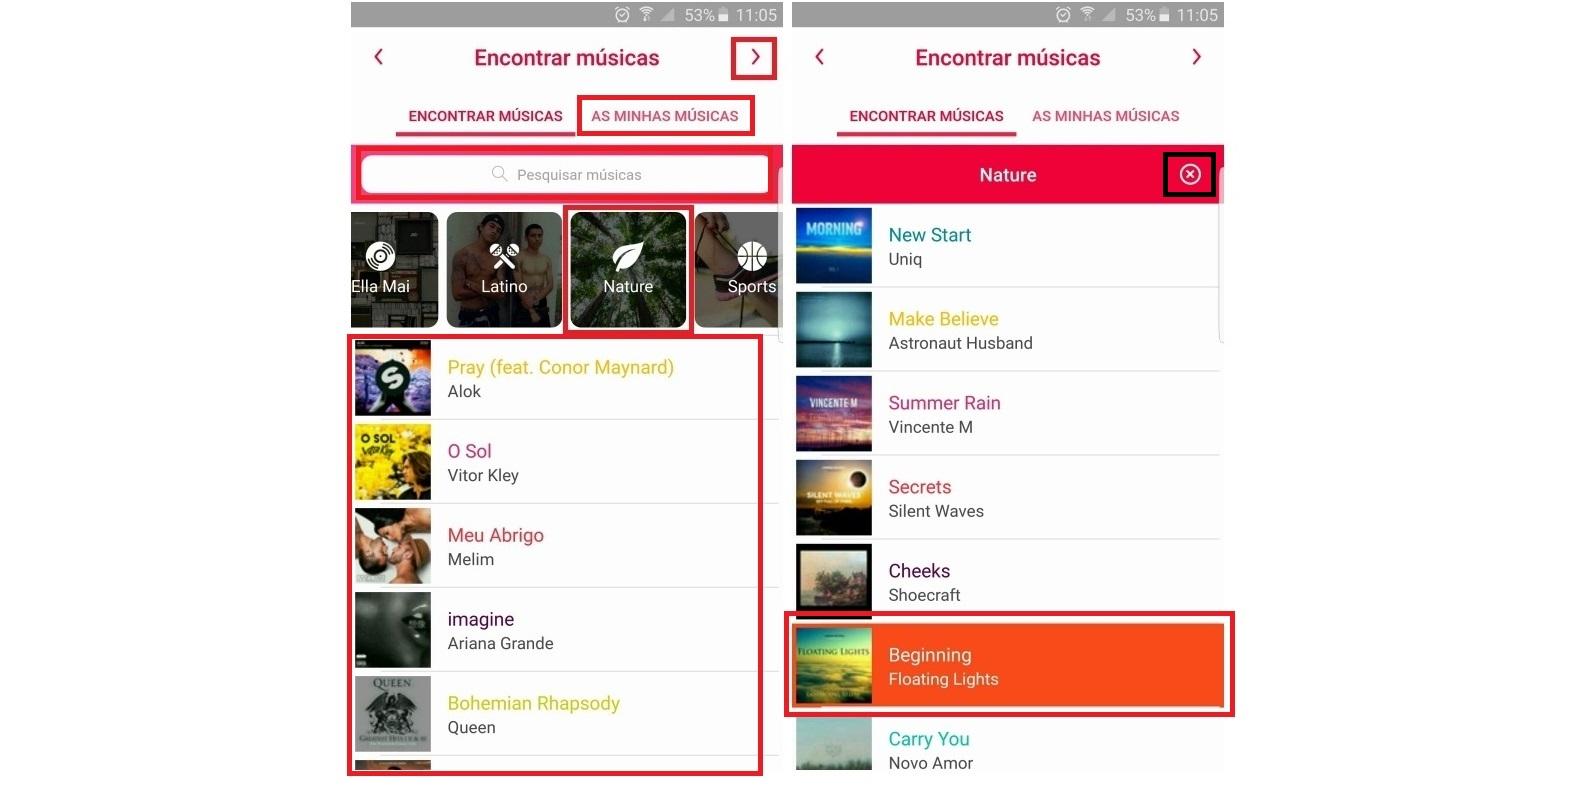 a725b1d75 Saiba como criar vídeos temáticos utilizando o app Lomotif - TecMundo